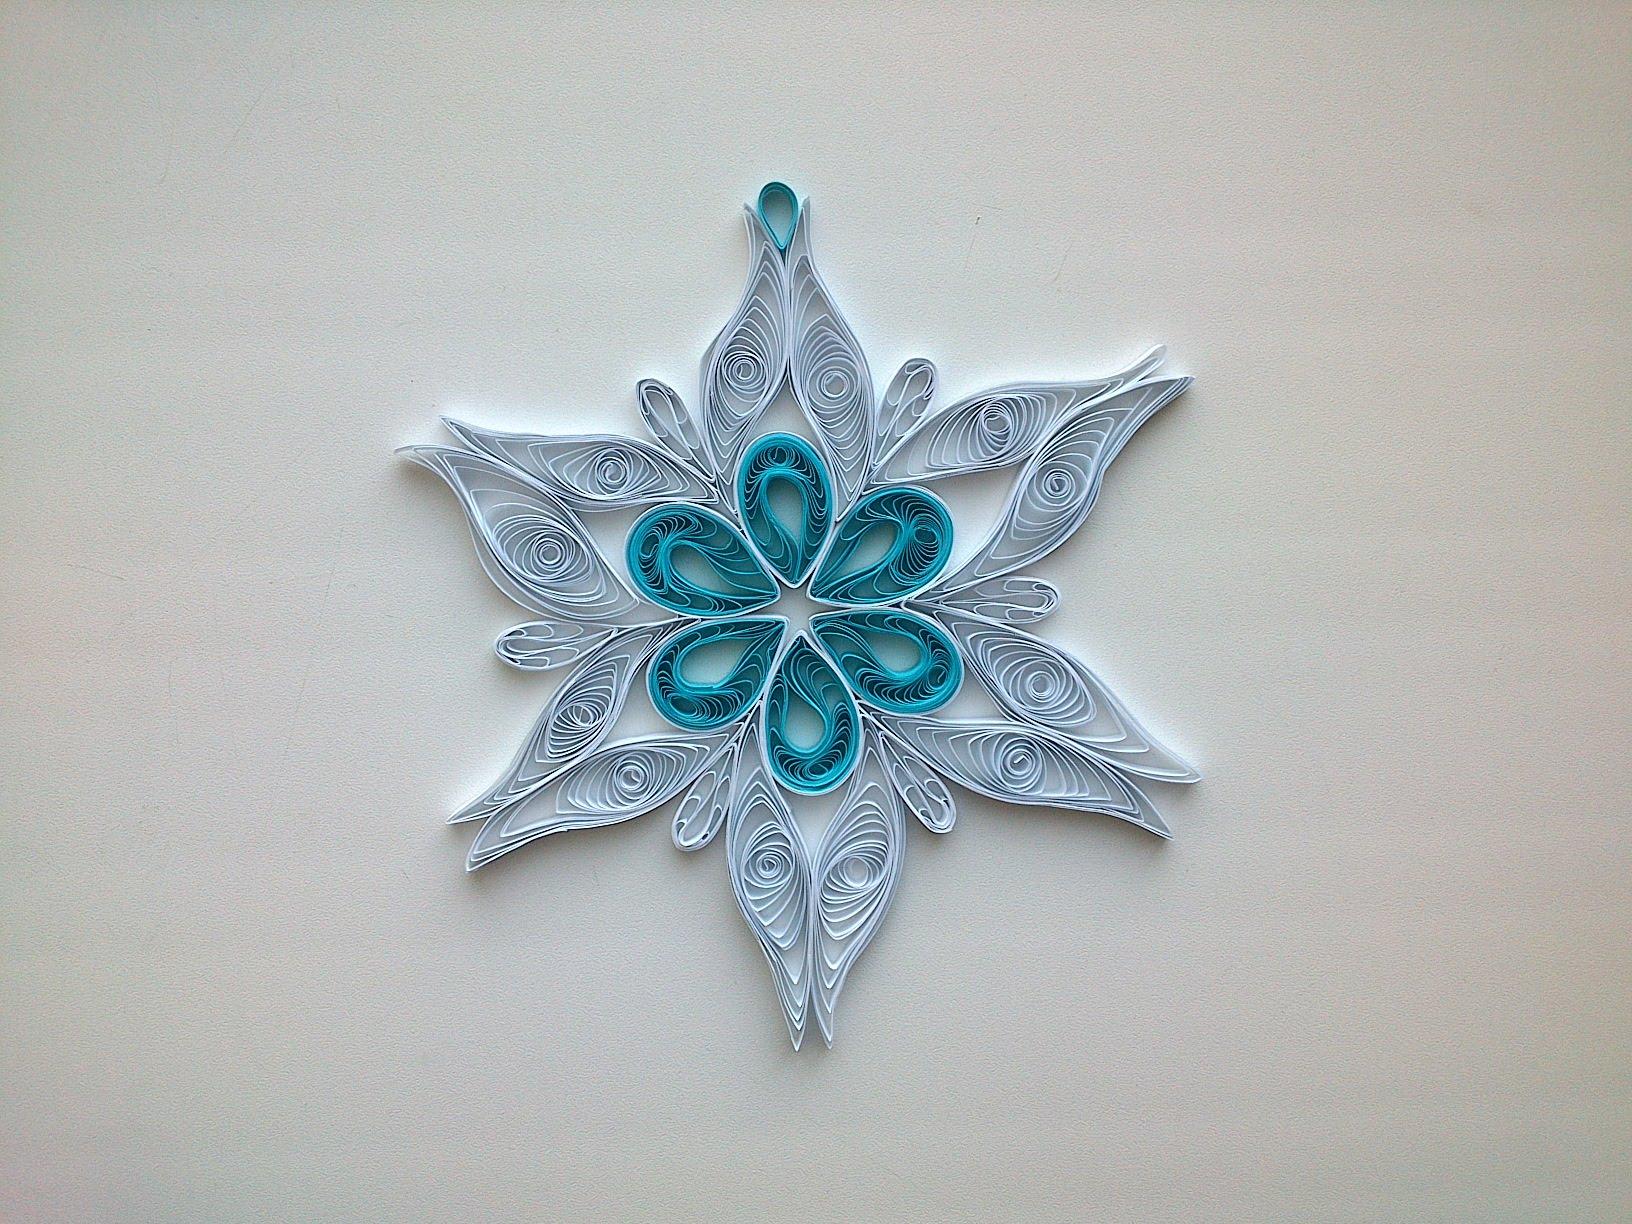 Снежинки из бумаги квиллинг